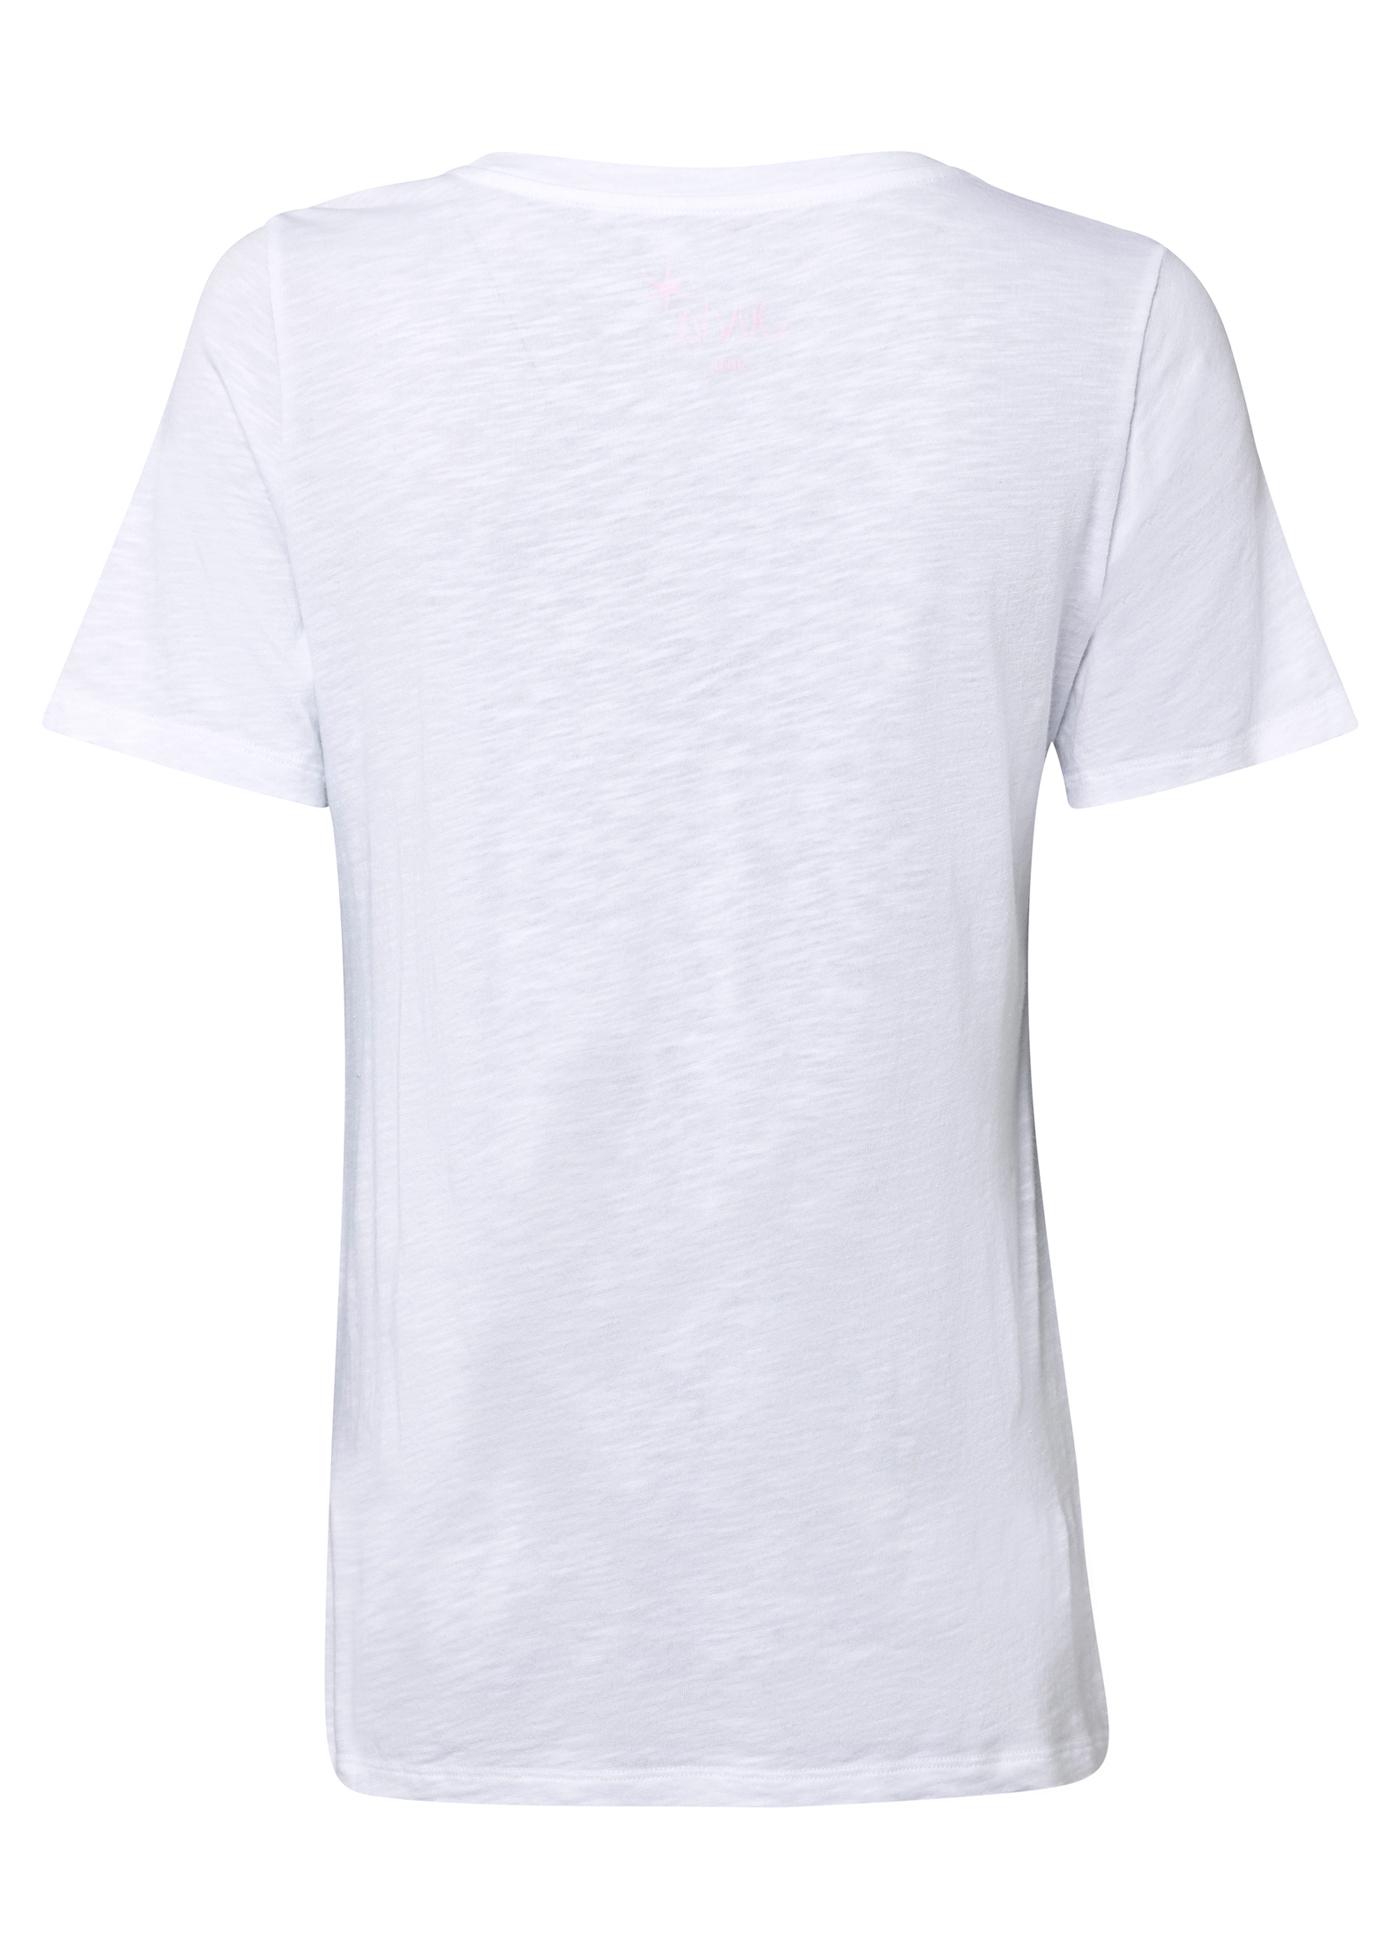 "CO Slub Shirt ""Capri image number 1"